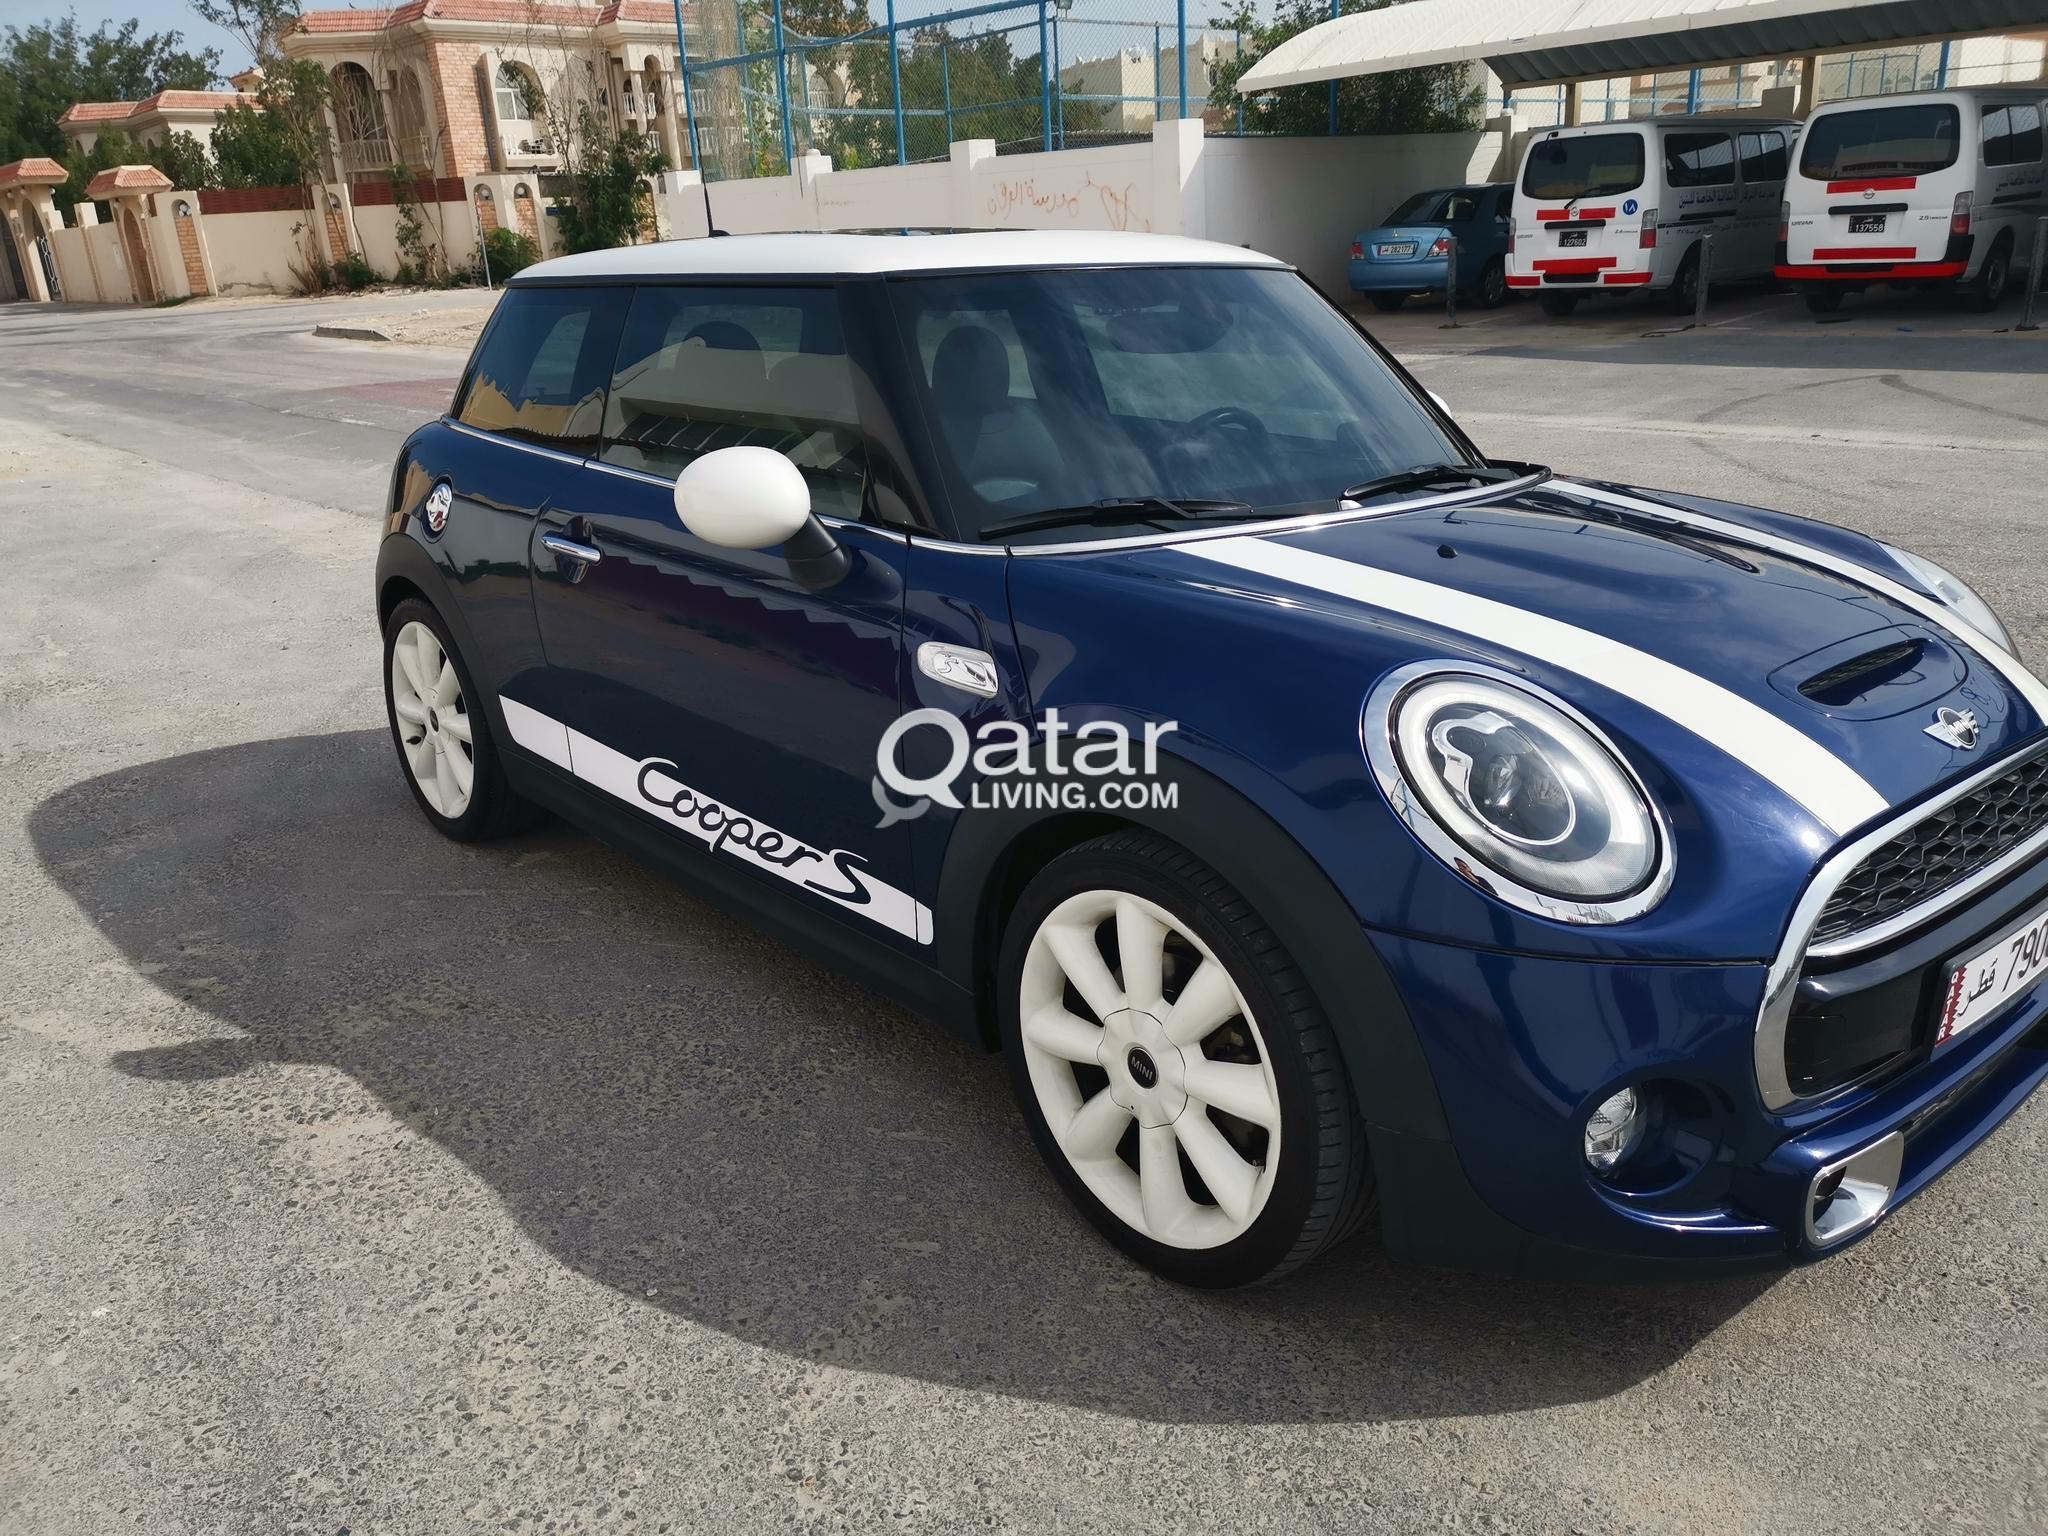 Mini Cooper S 2014 Jcw Exhaust Qatar Living